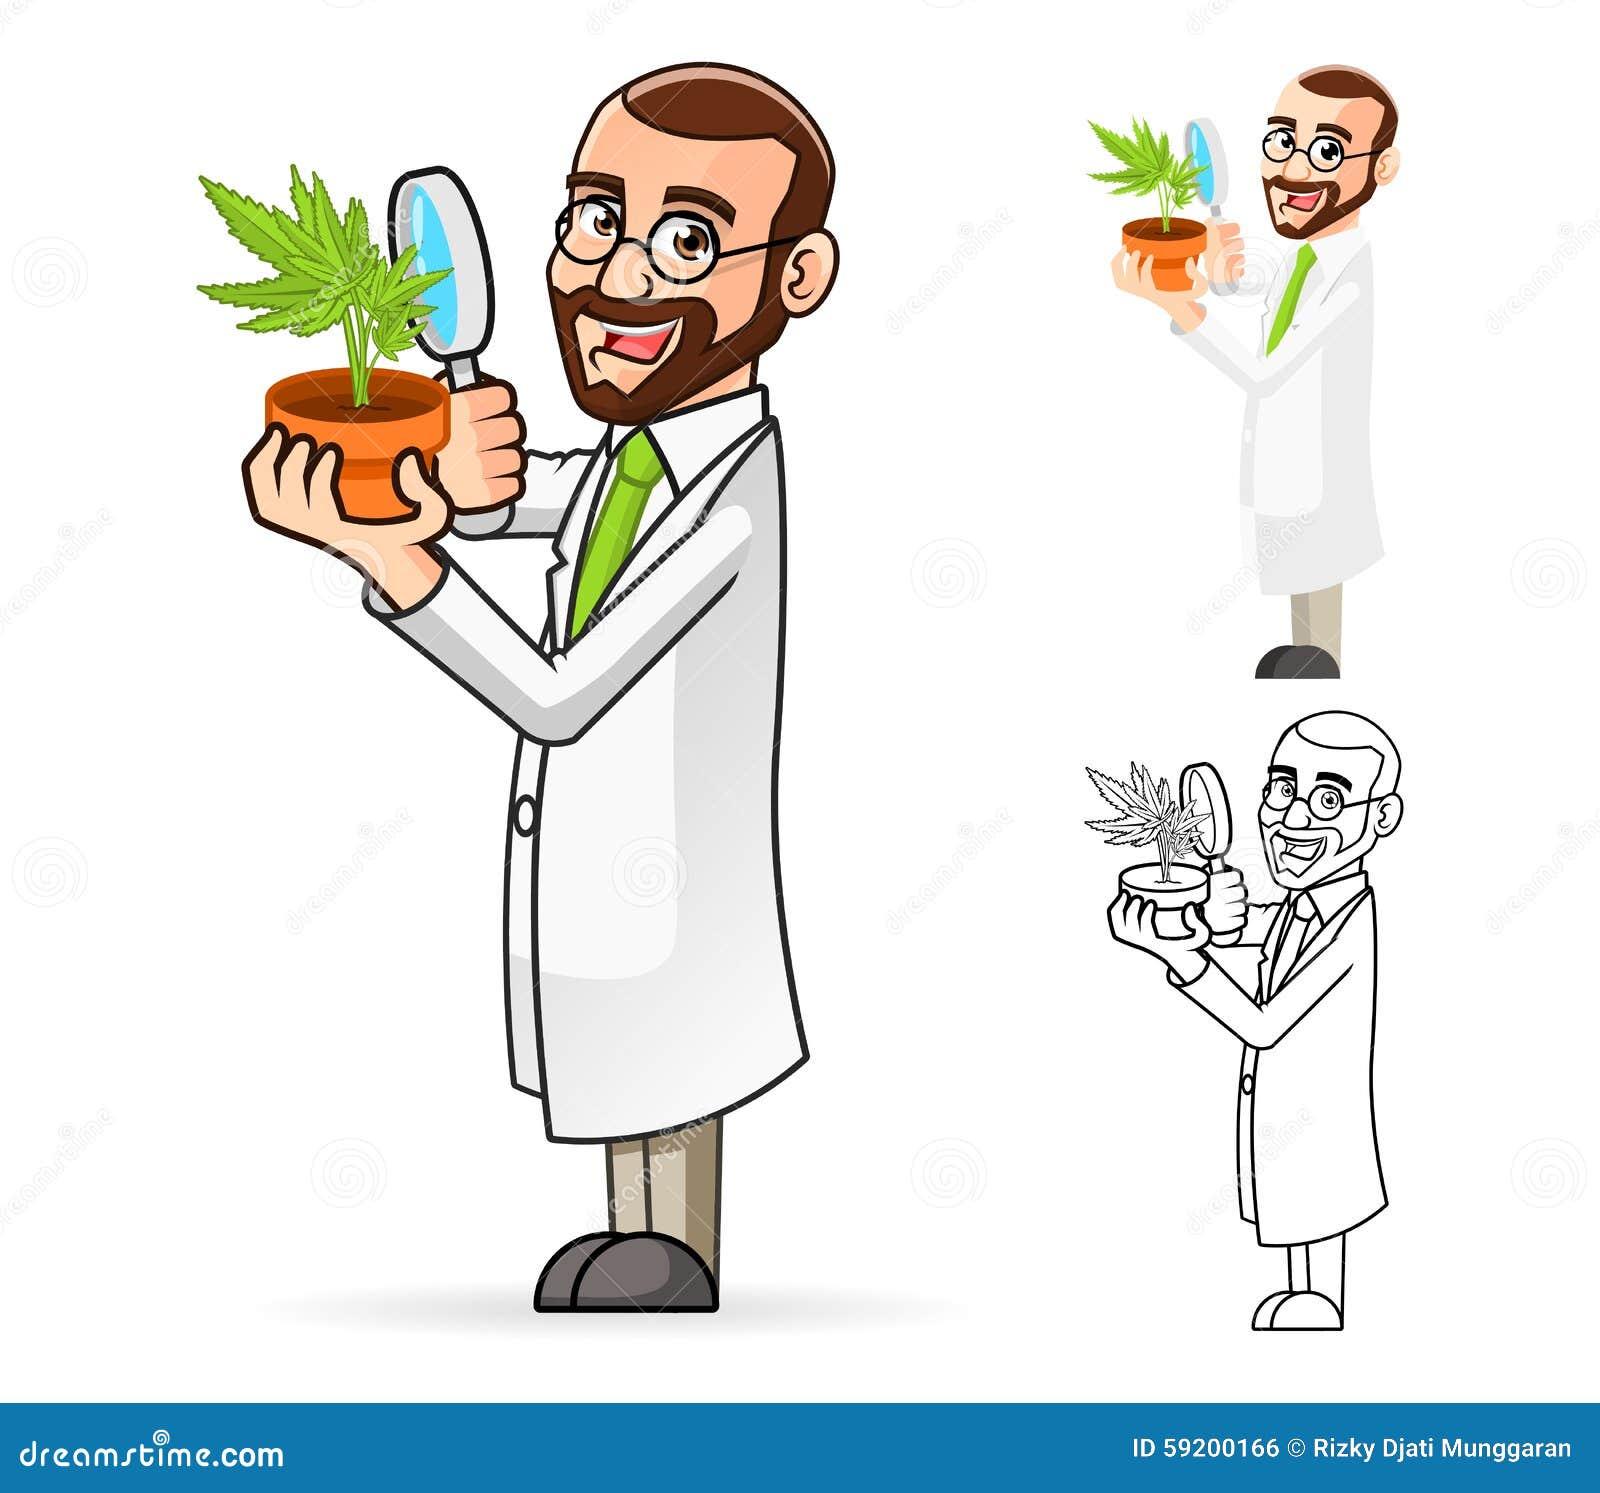 Botanico cartoon character looking in una pianta tramite